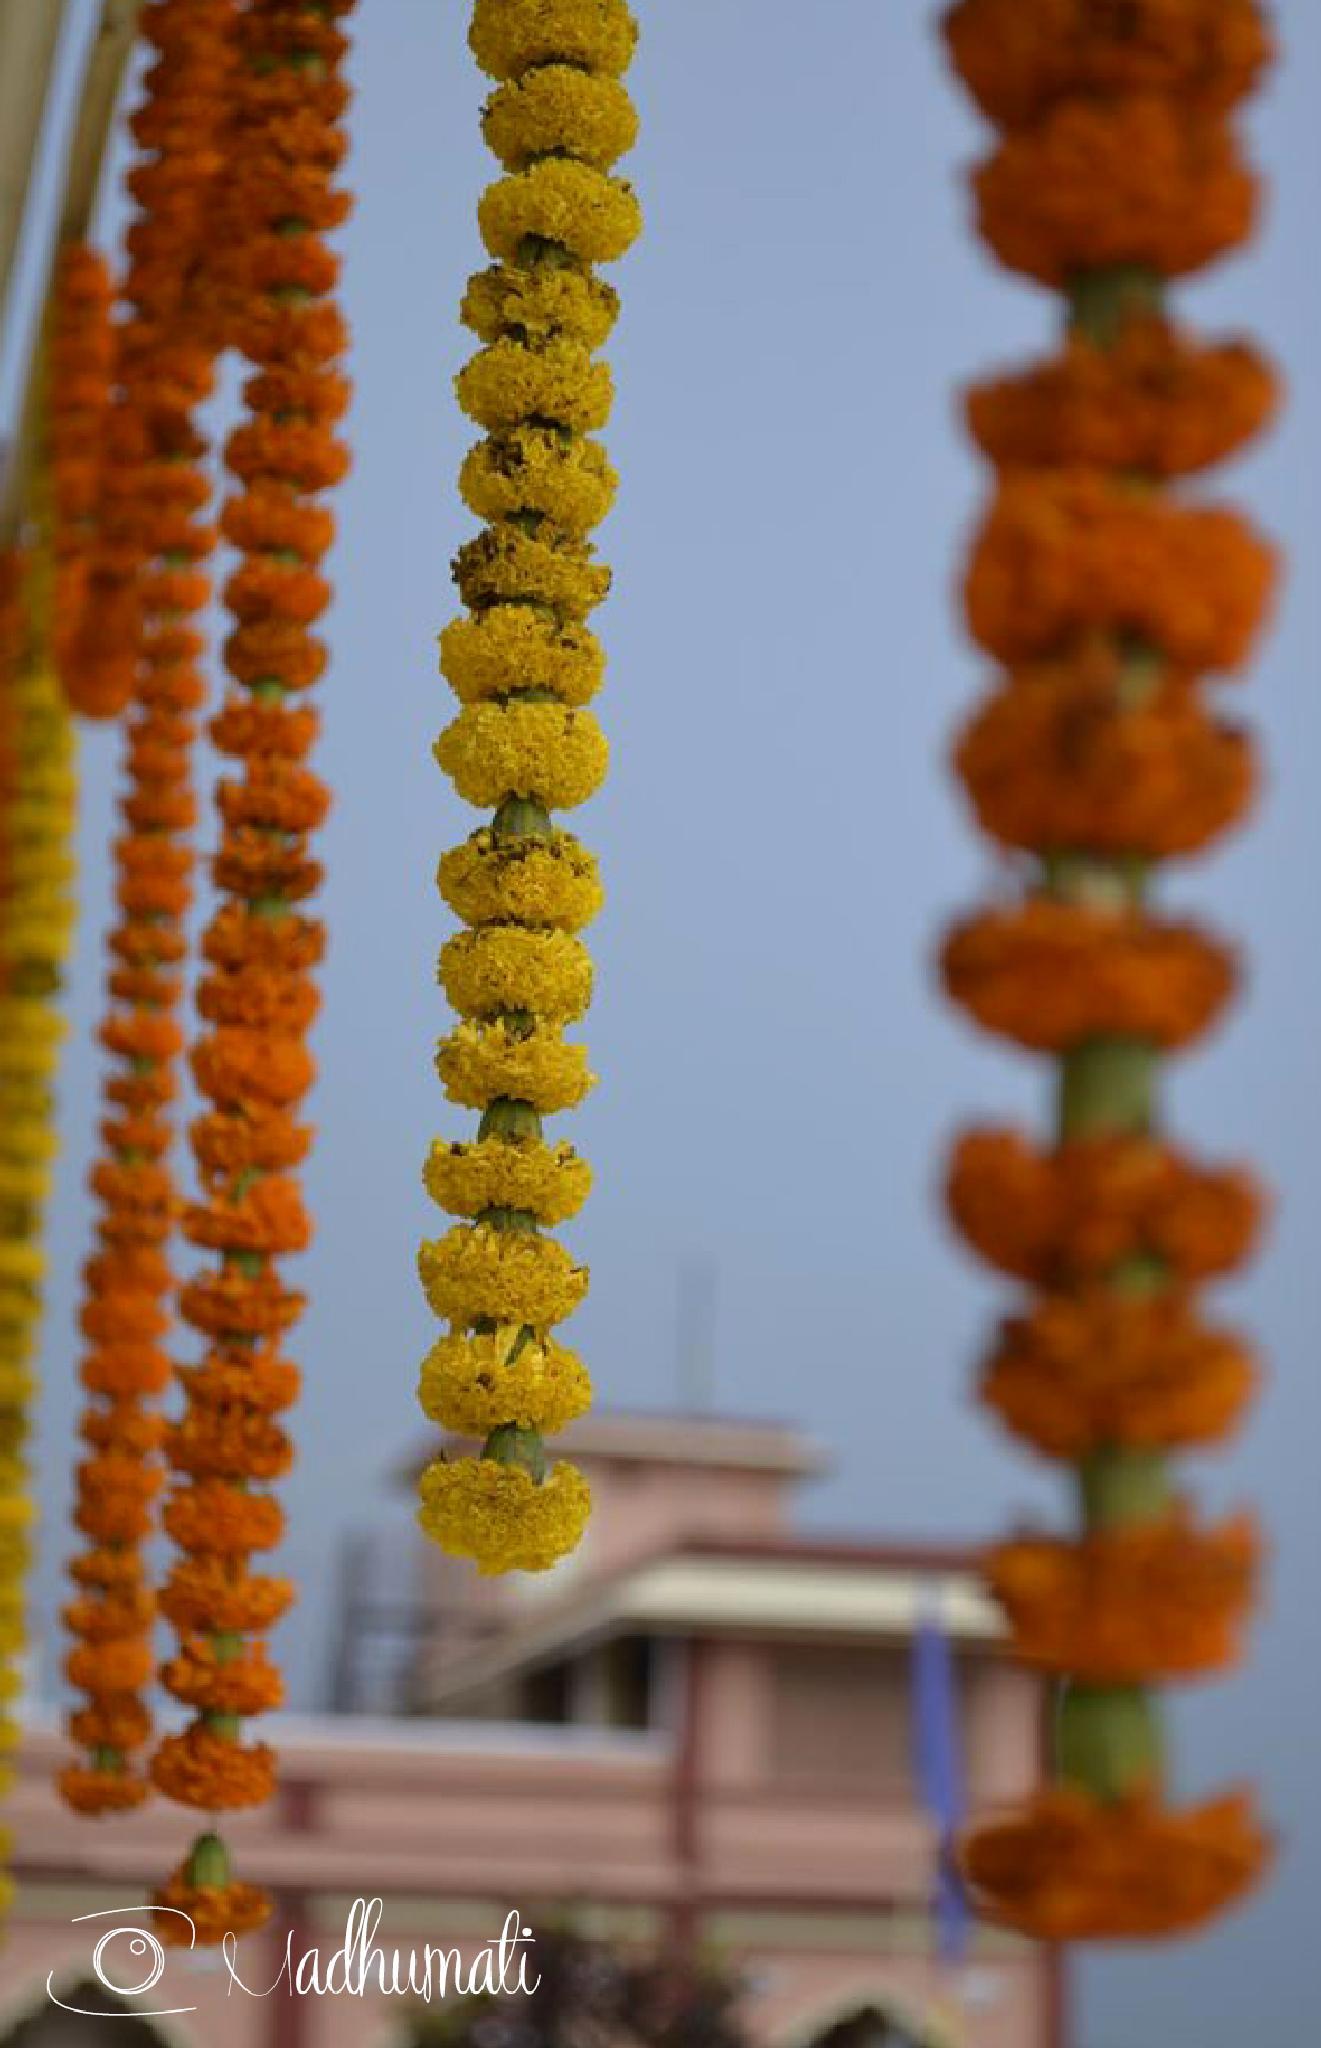 Mayapur | Índia by madhumati